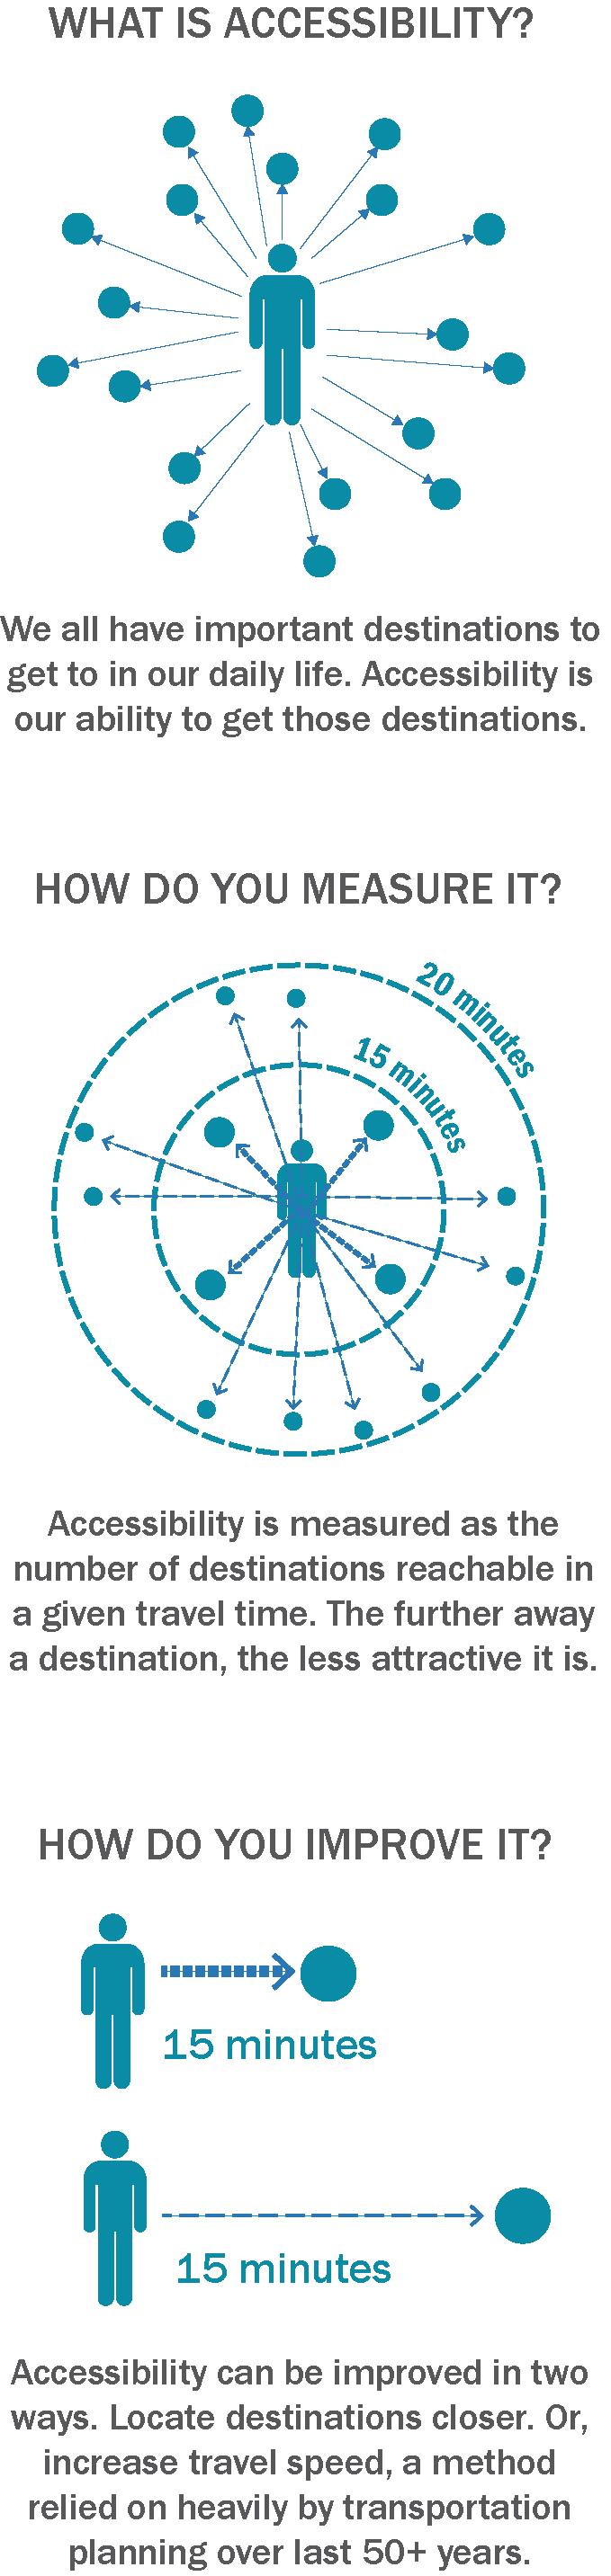 Multimodal Accessibility Analysis — Renaissance Planning